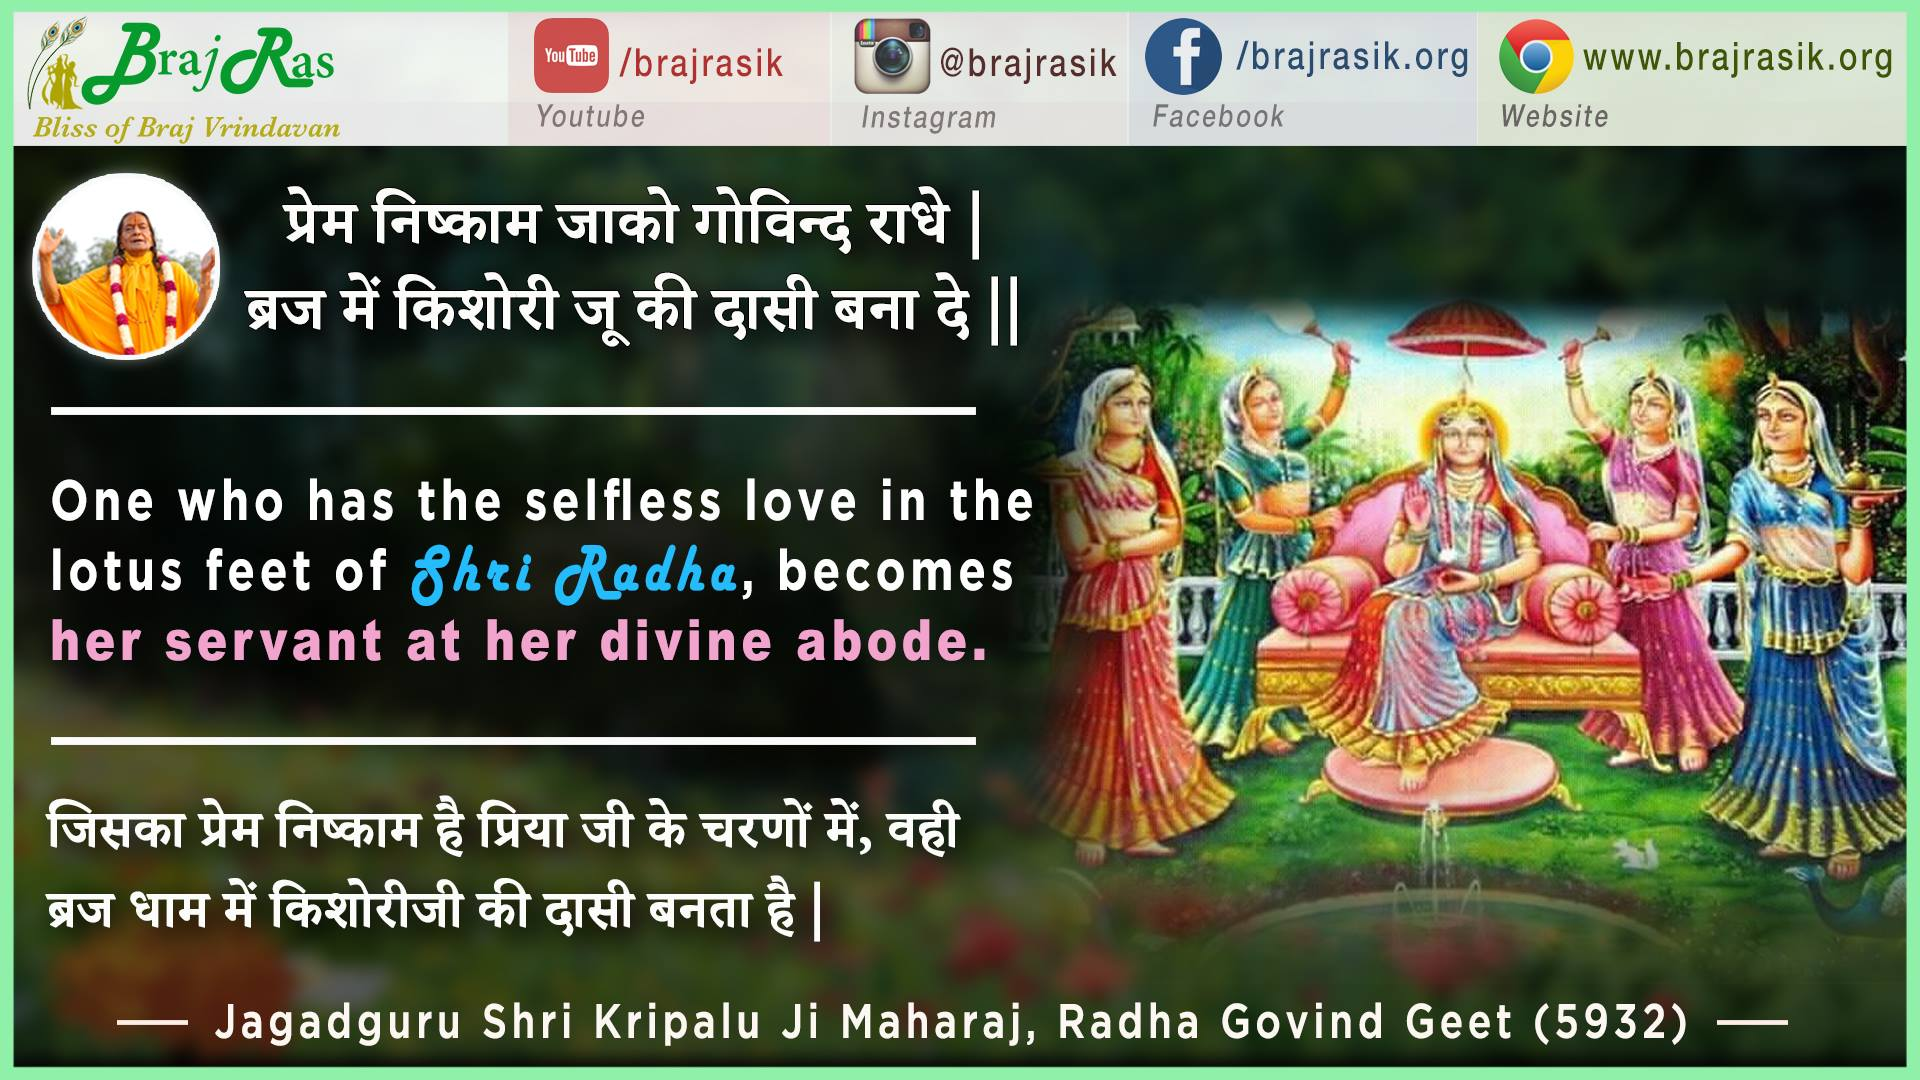 Prem Nishkaam Jaako Govind Radhe - Jagadguru Shri Kripaluji Maharaj, Radha Govind Geet (5922)